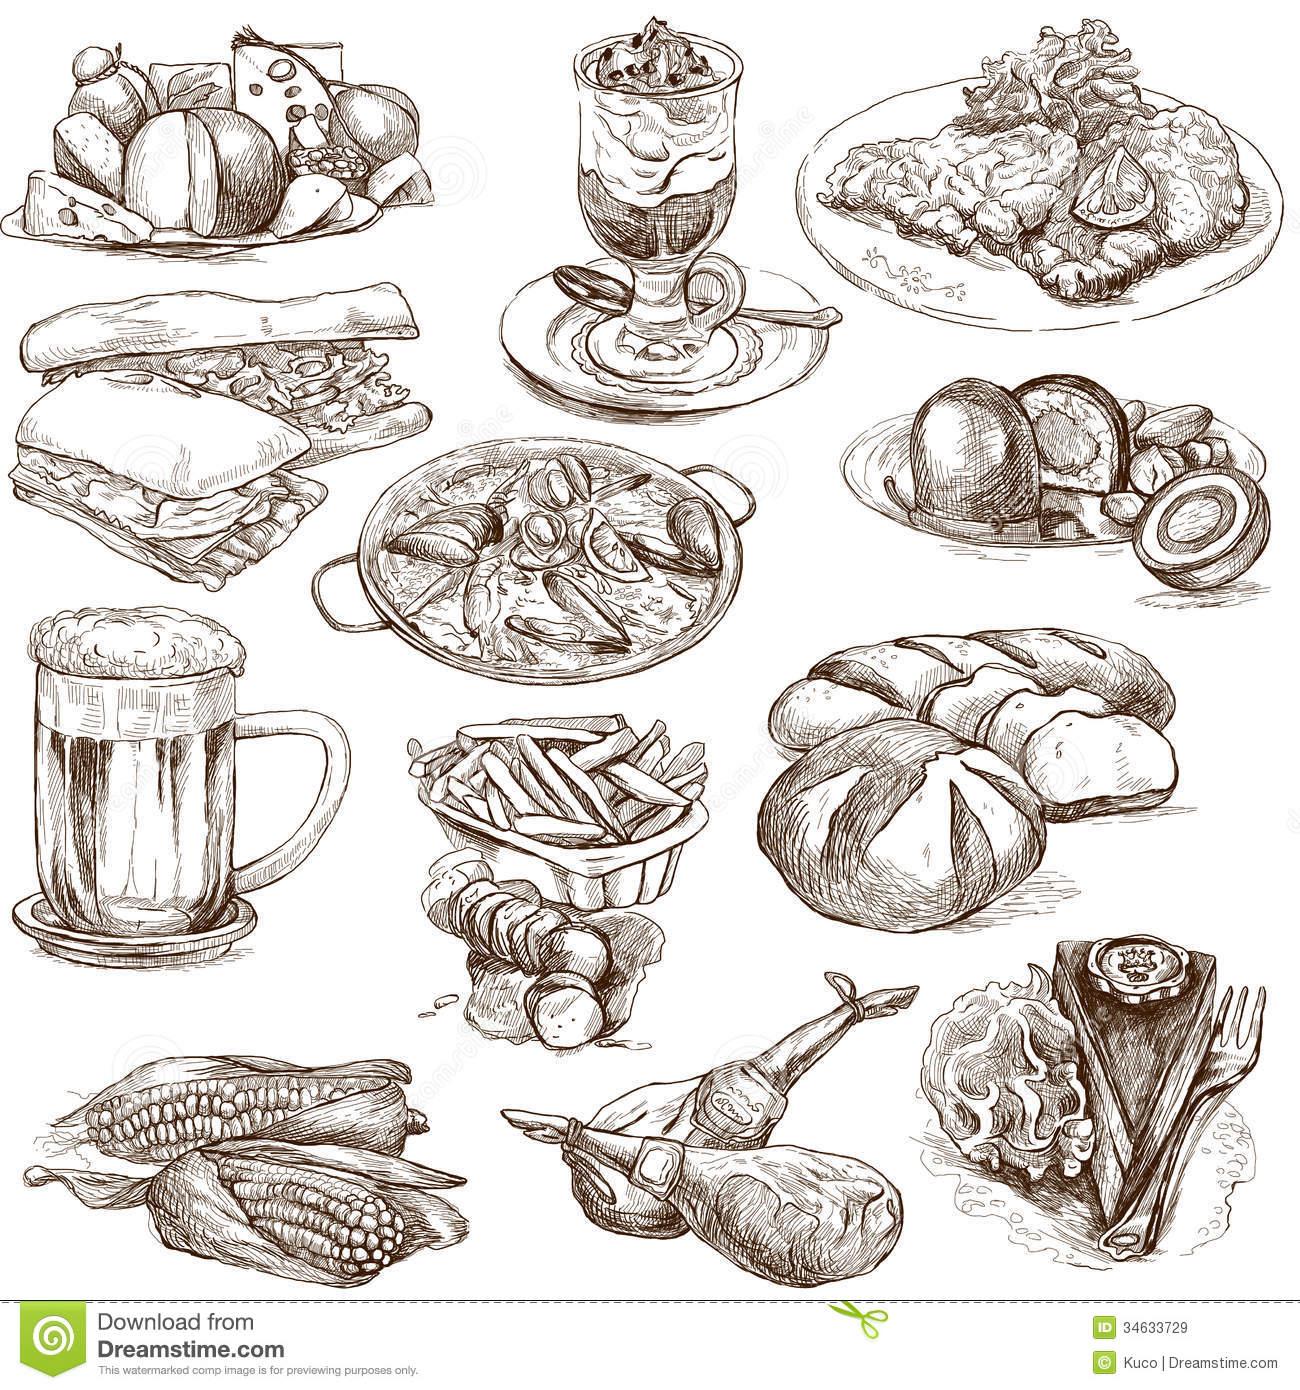 Drawn food Sized description full illustrations white